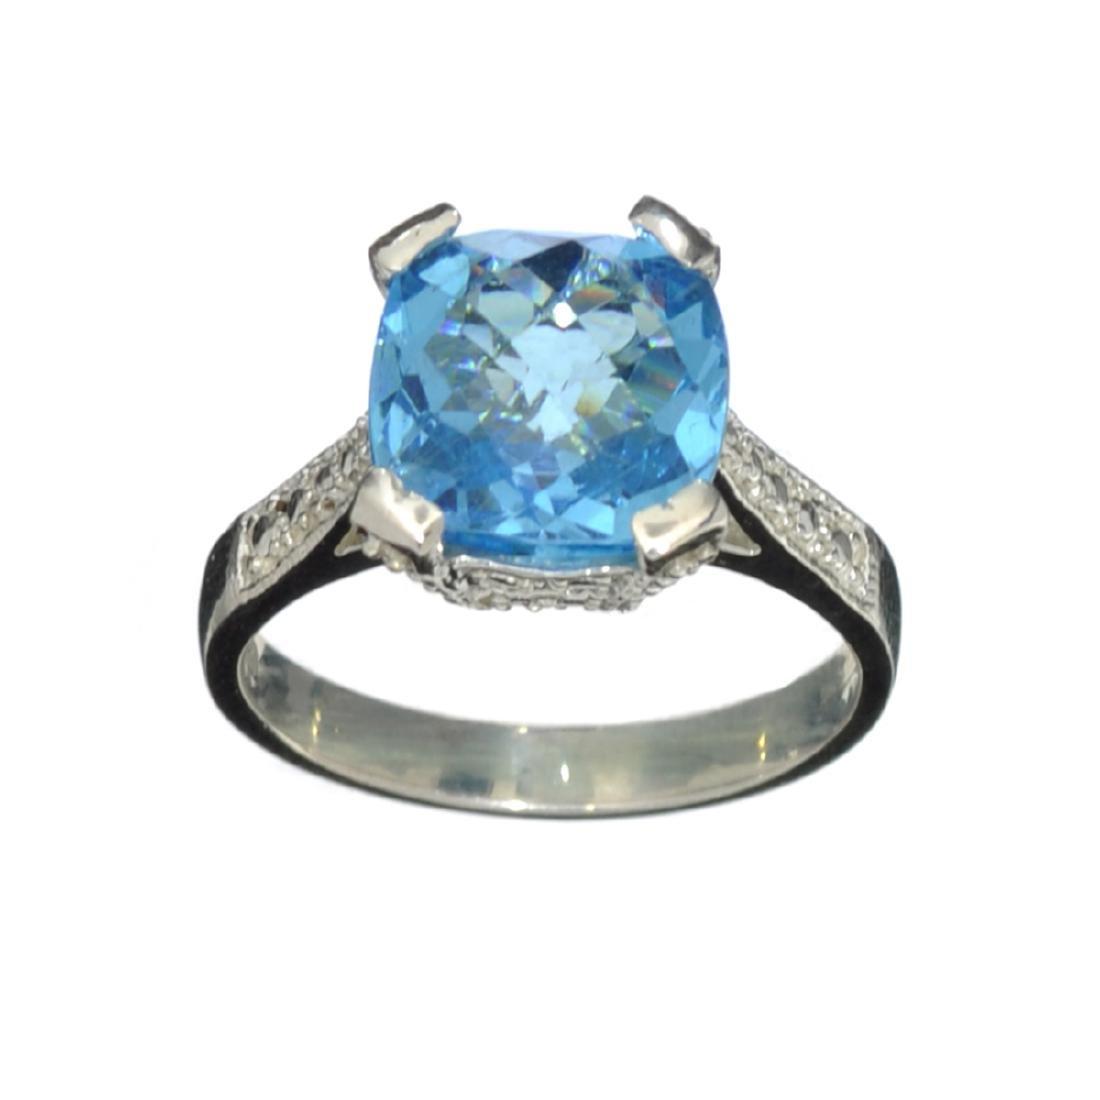 Fine Jewelry Designer Sebastian 4.25CT Square Cushion